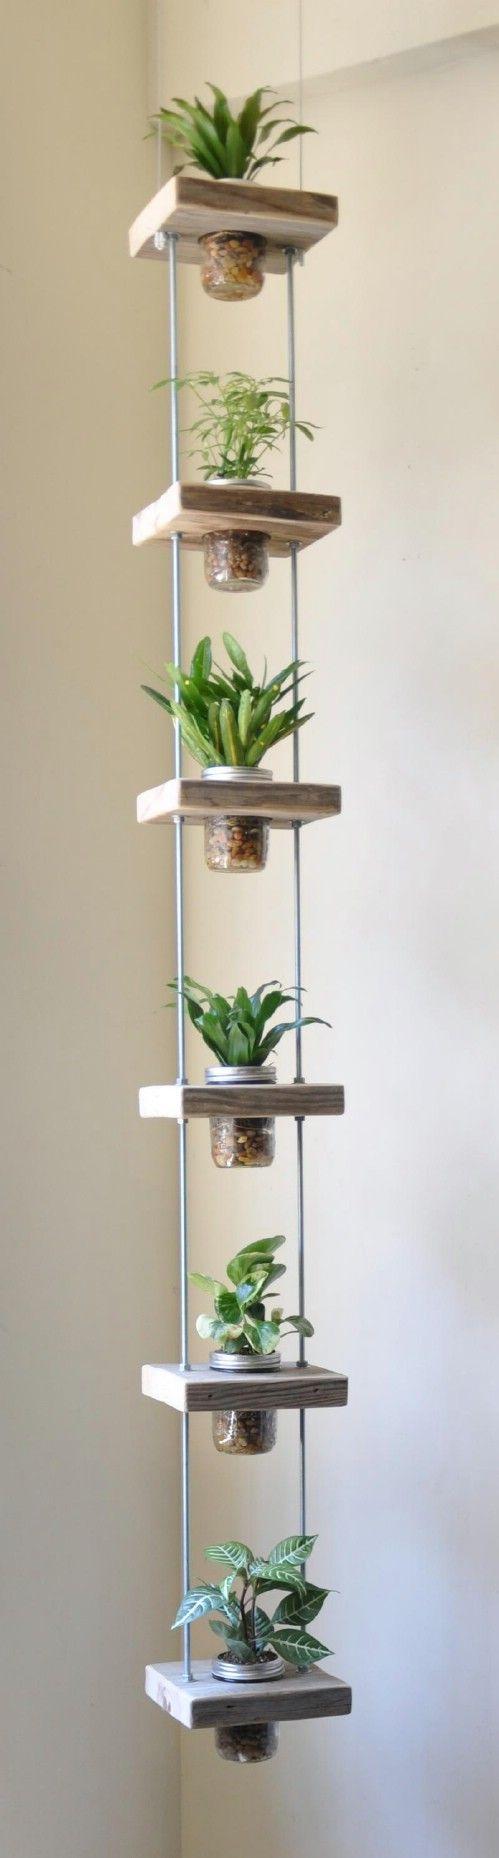 Simple Hanging Garden-diy gardens plus herb growing tips/how to